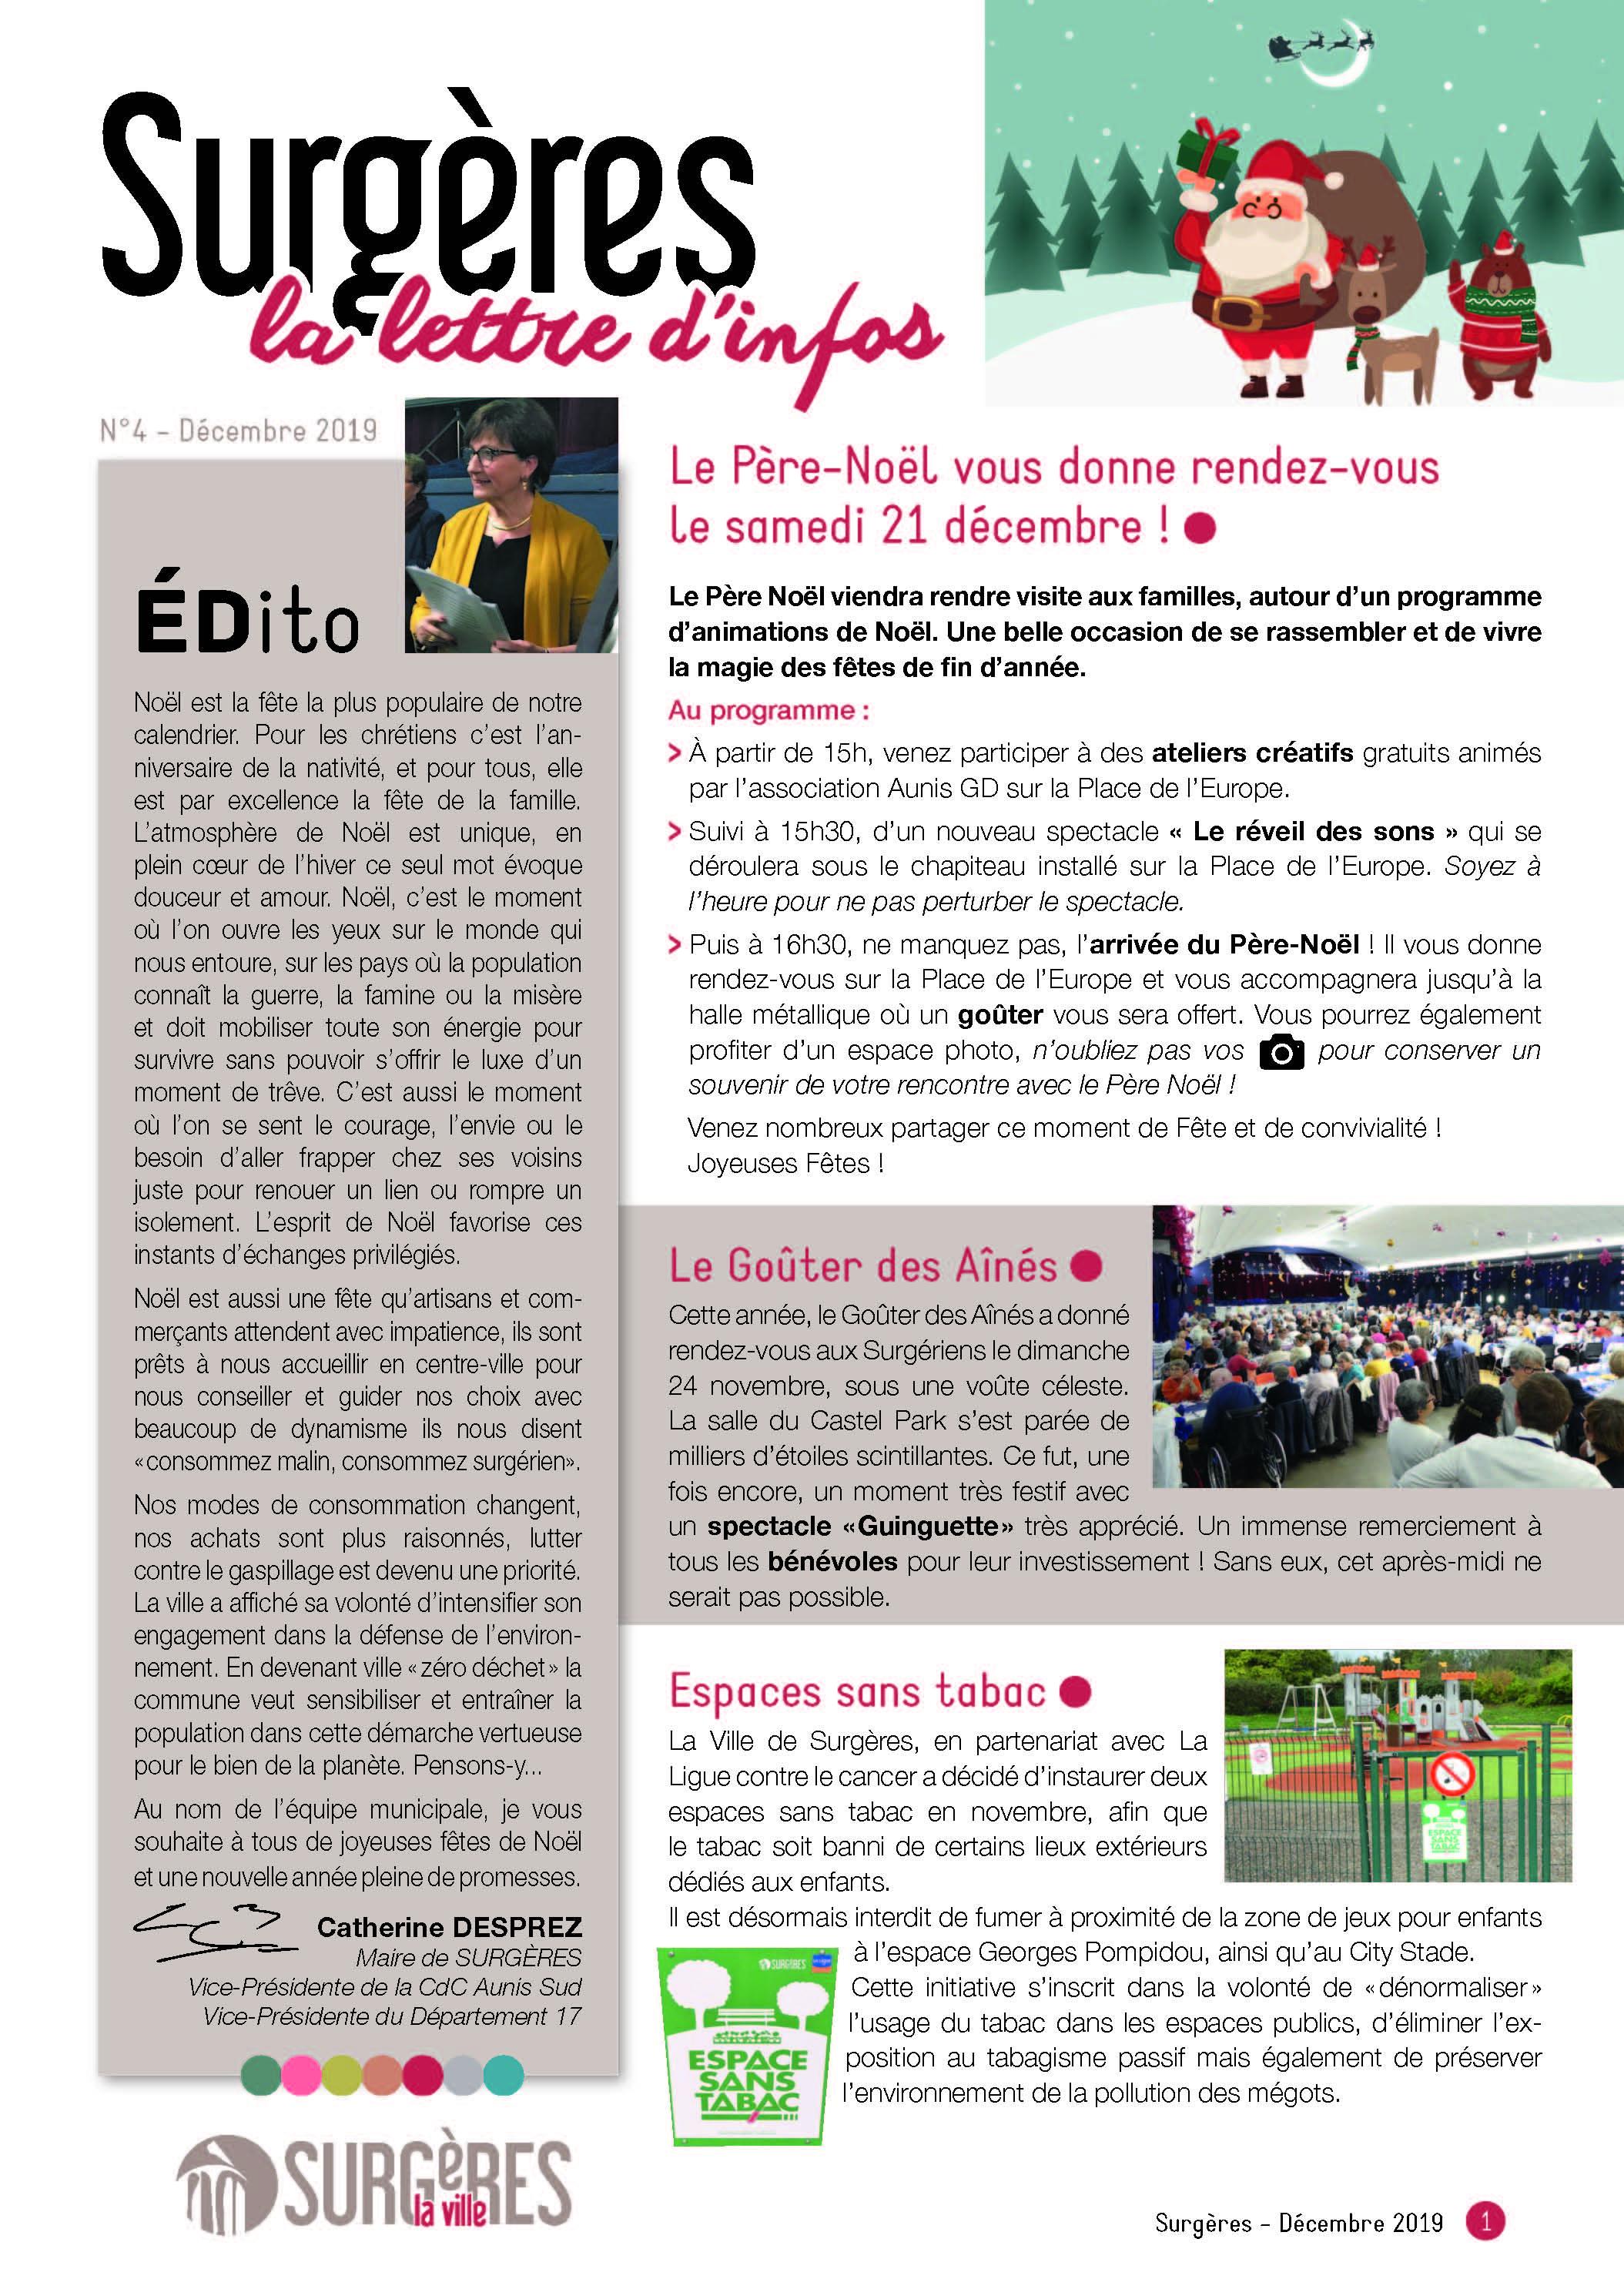 <strong>Bulletin municipal</strong> du 09 décembre 2019